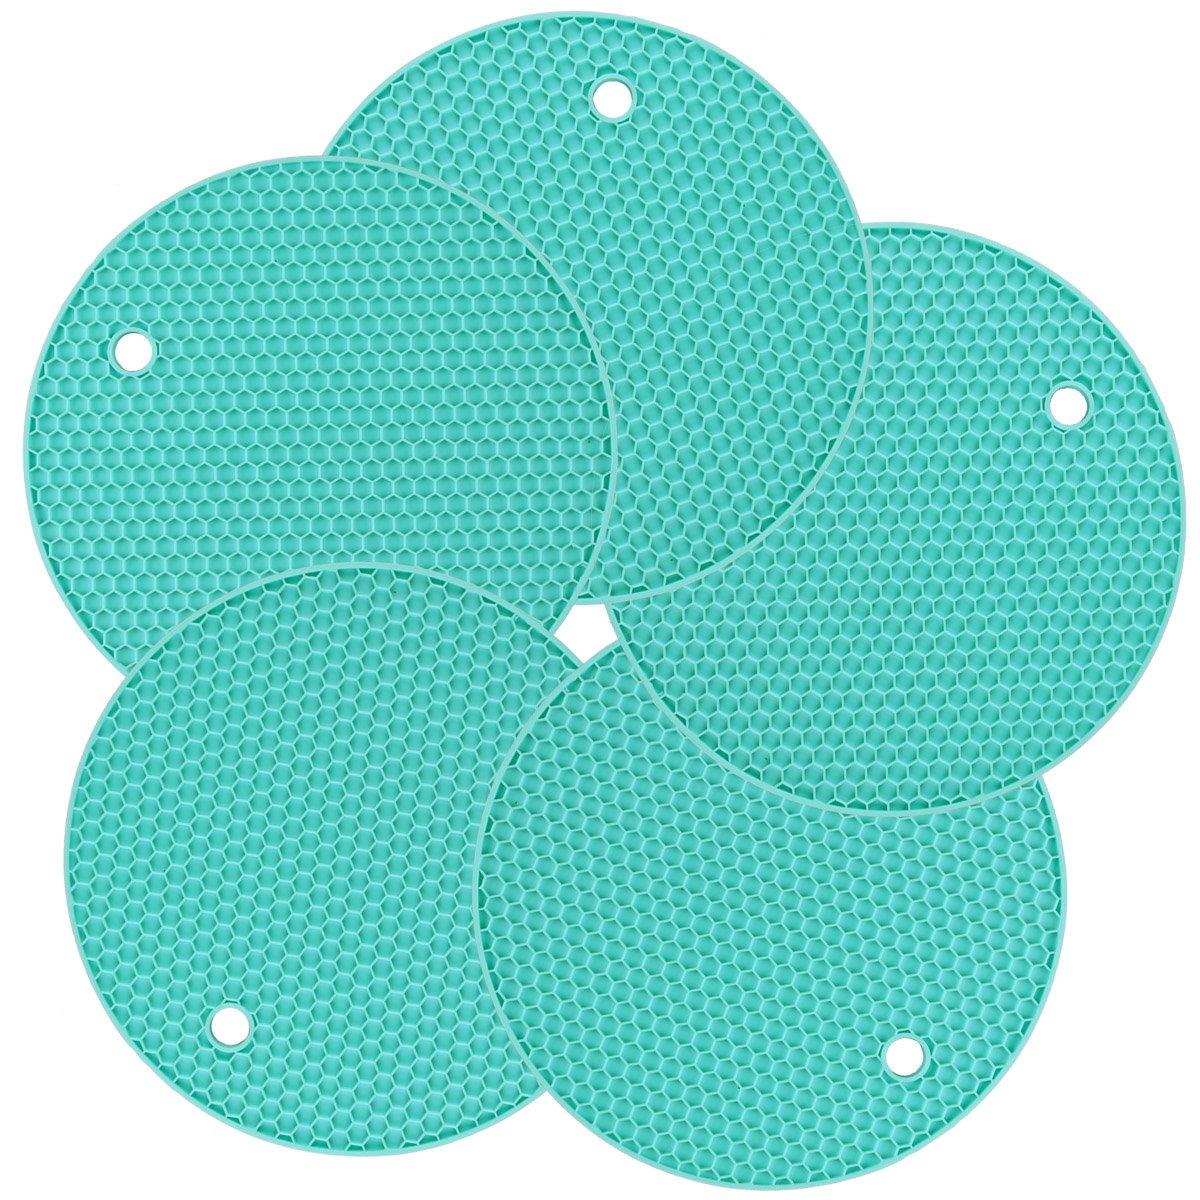 Set of 5 Silicone Pot Holders/Hot Pads, Trivet Mats, Non Slip Durable Flexible Table Mats Round Honeycome Heat Resistant Pot Coaster (Cyan) LogHog PHSL01TL